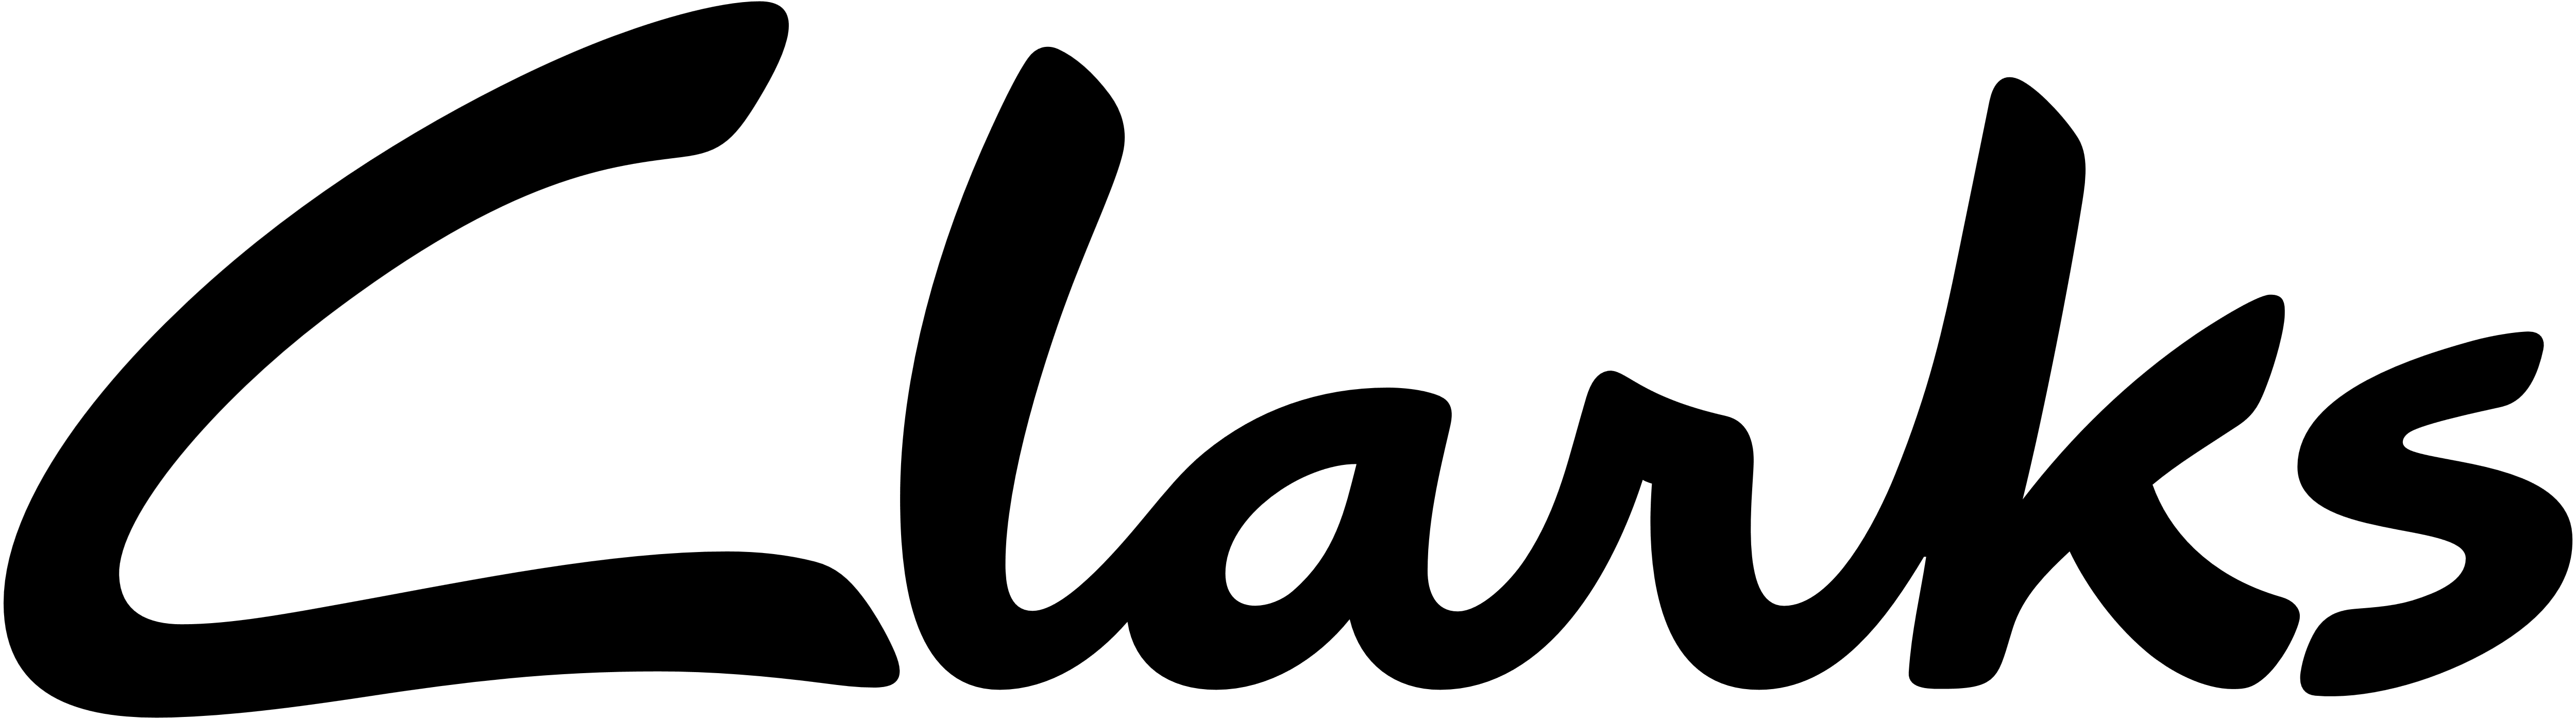 Clarks_logo_logotype